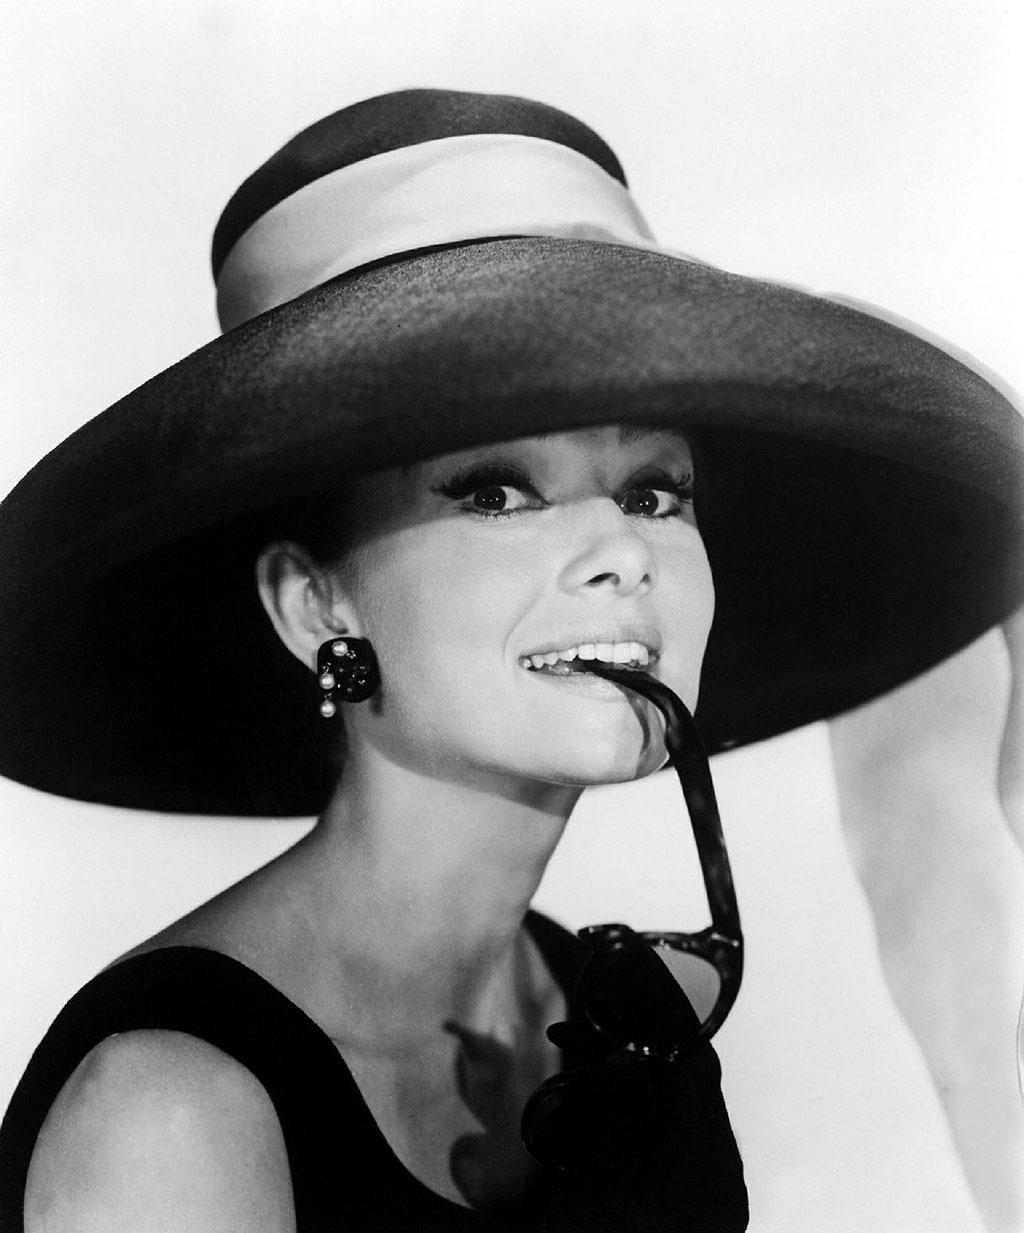 Cimitero dove è sepolta Audrey Hepburn